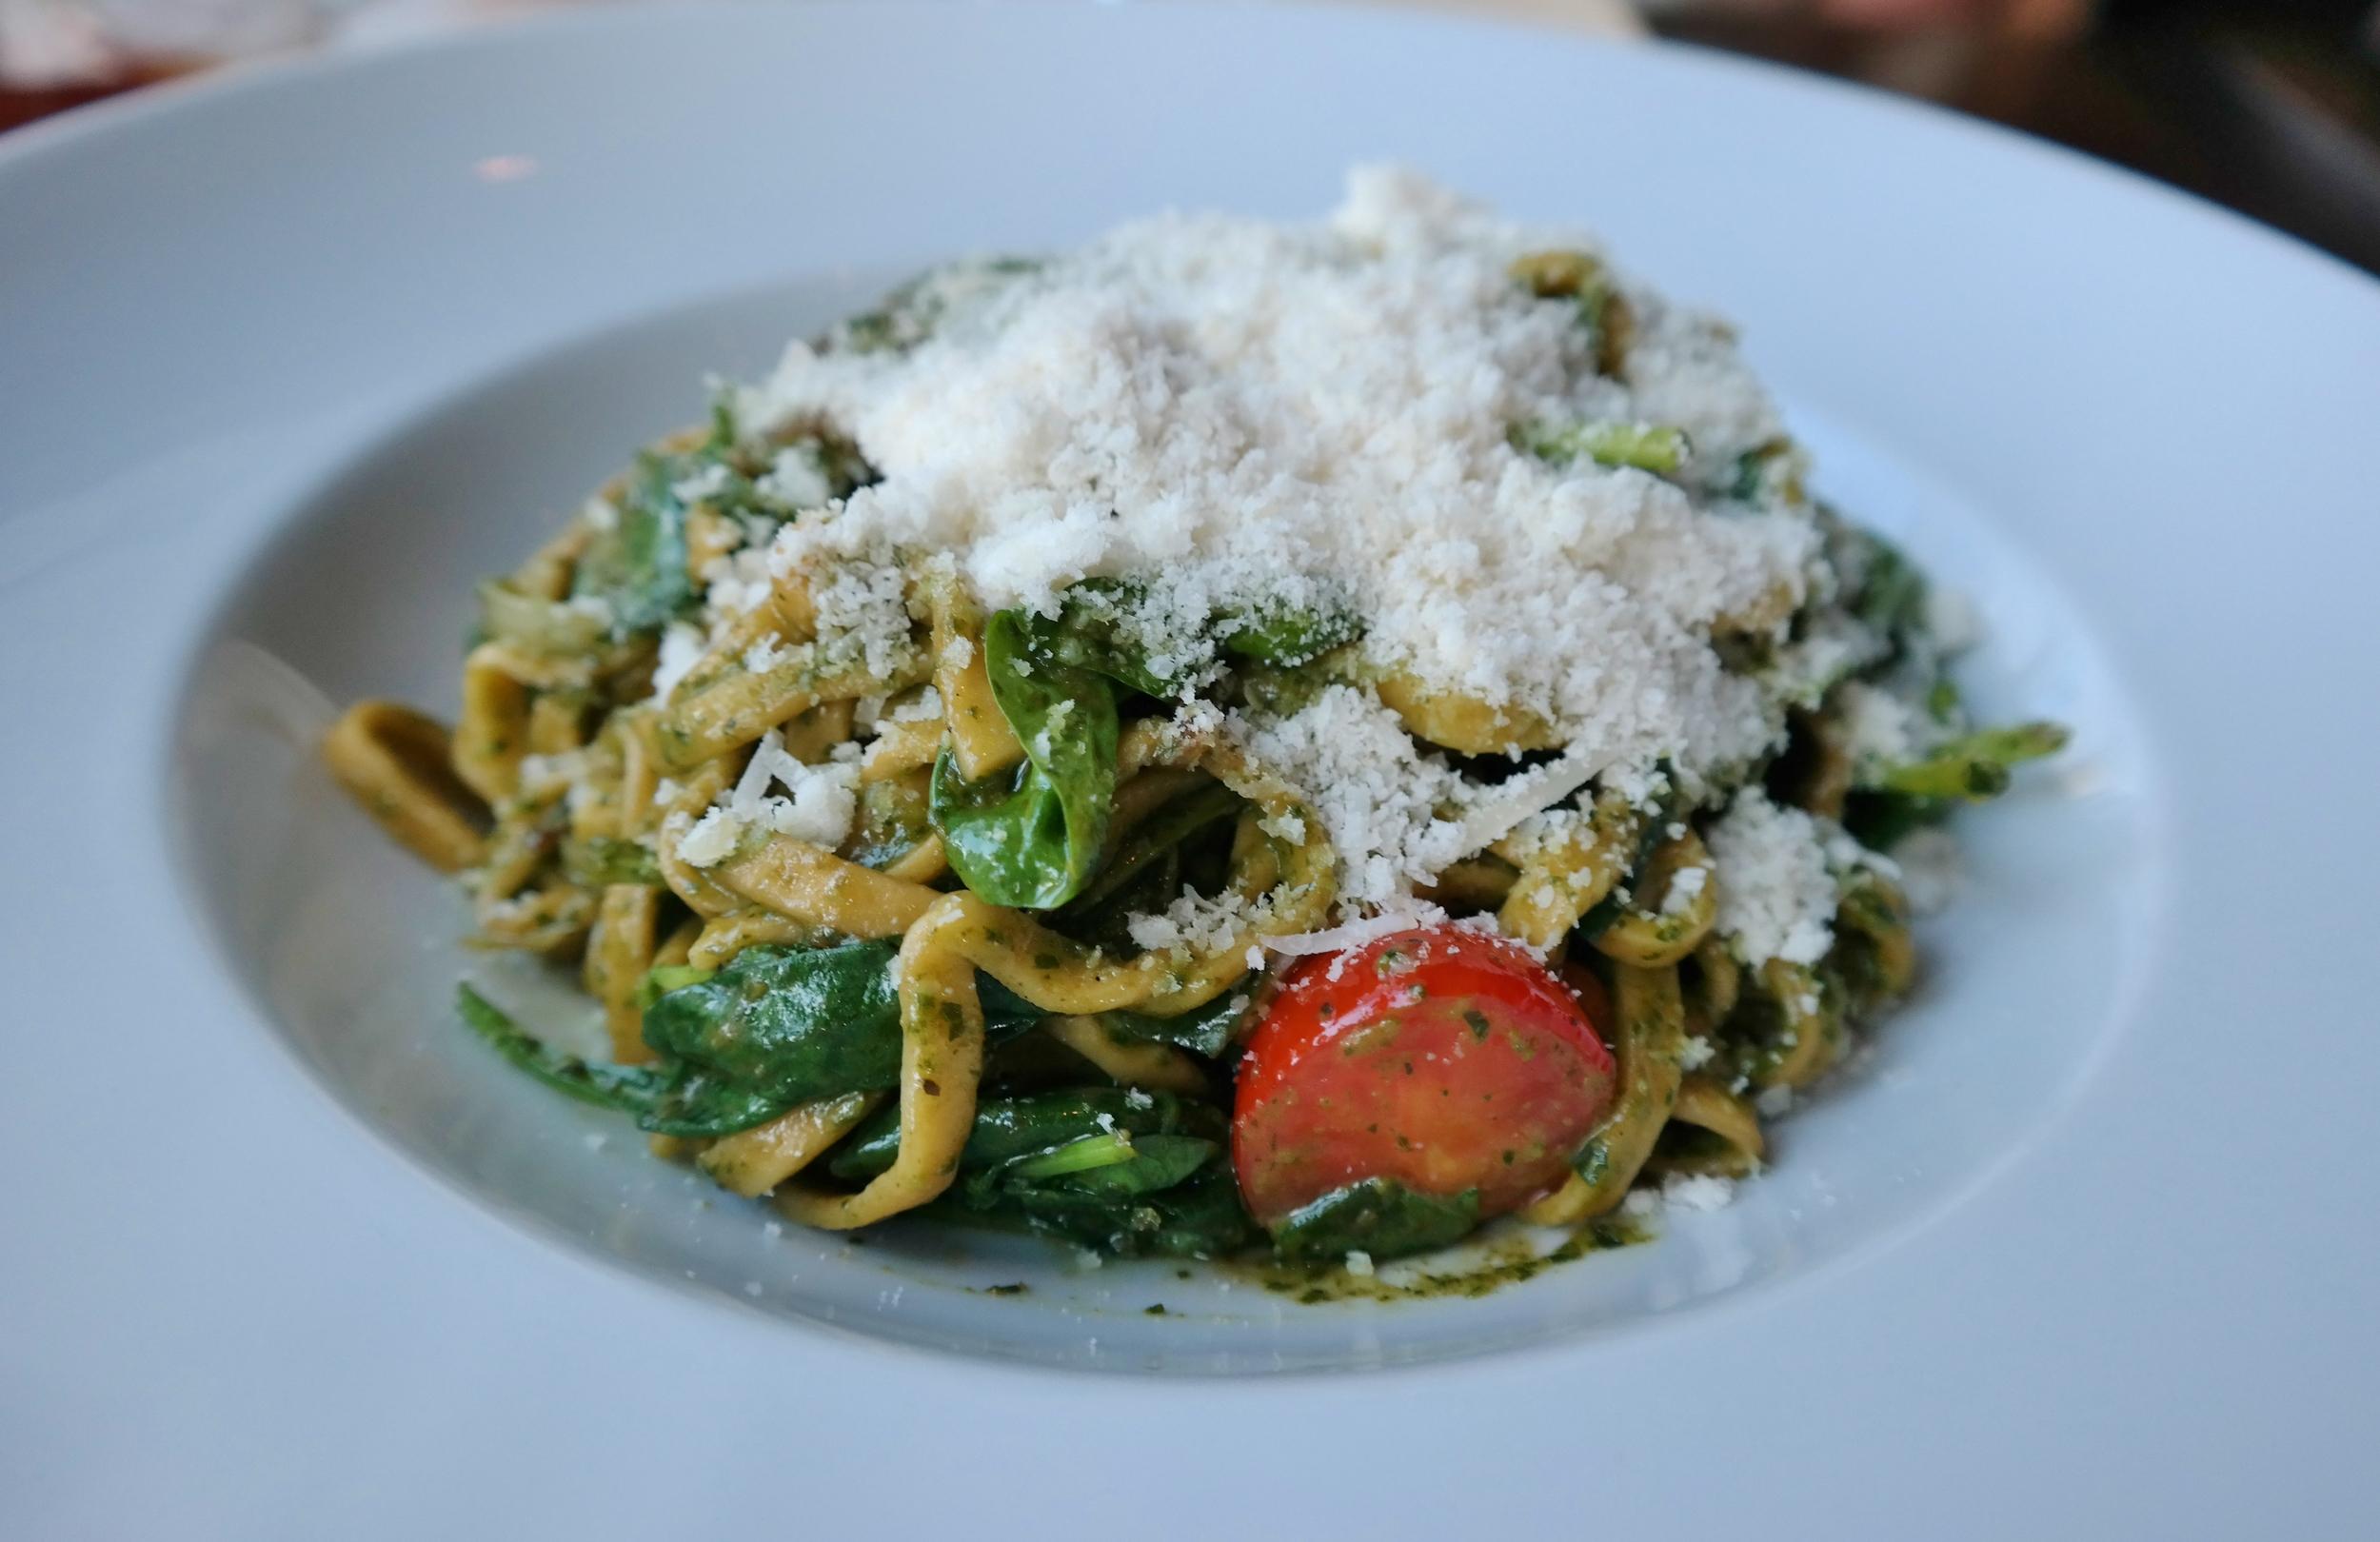 Handmade pasta with pesto and tomatoes